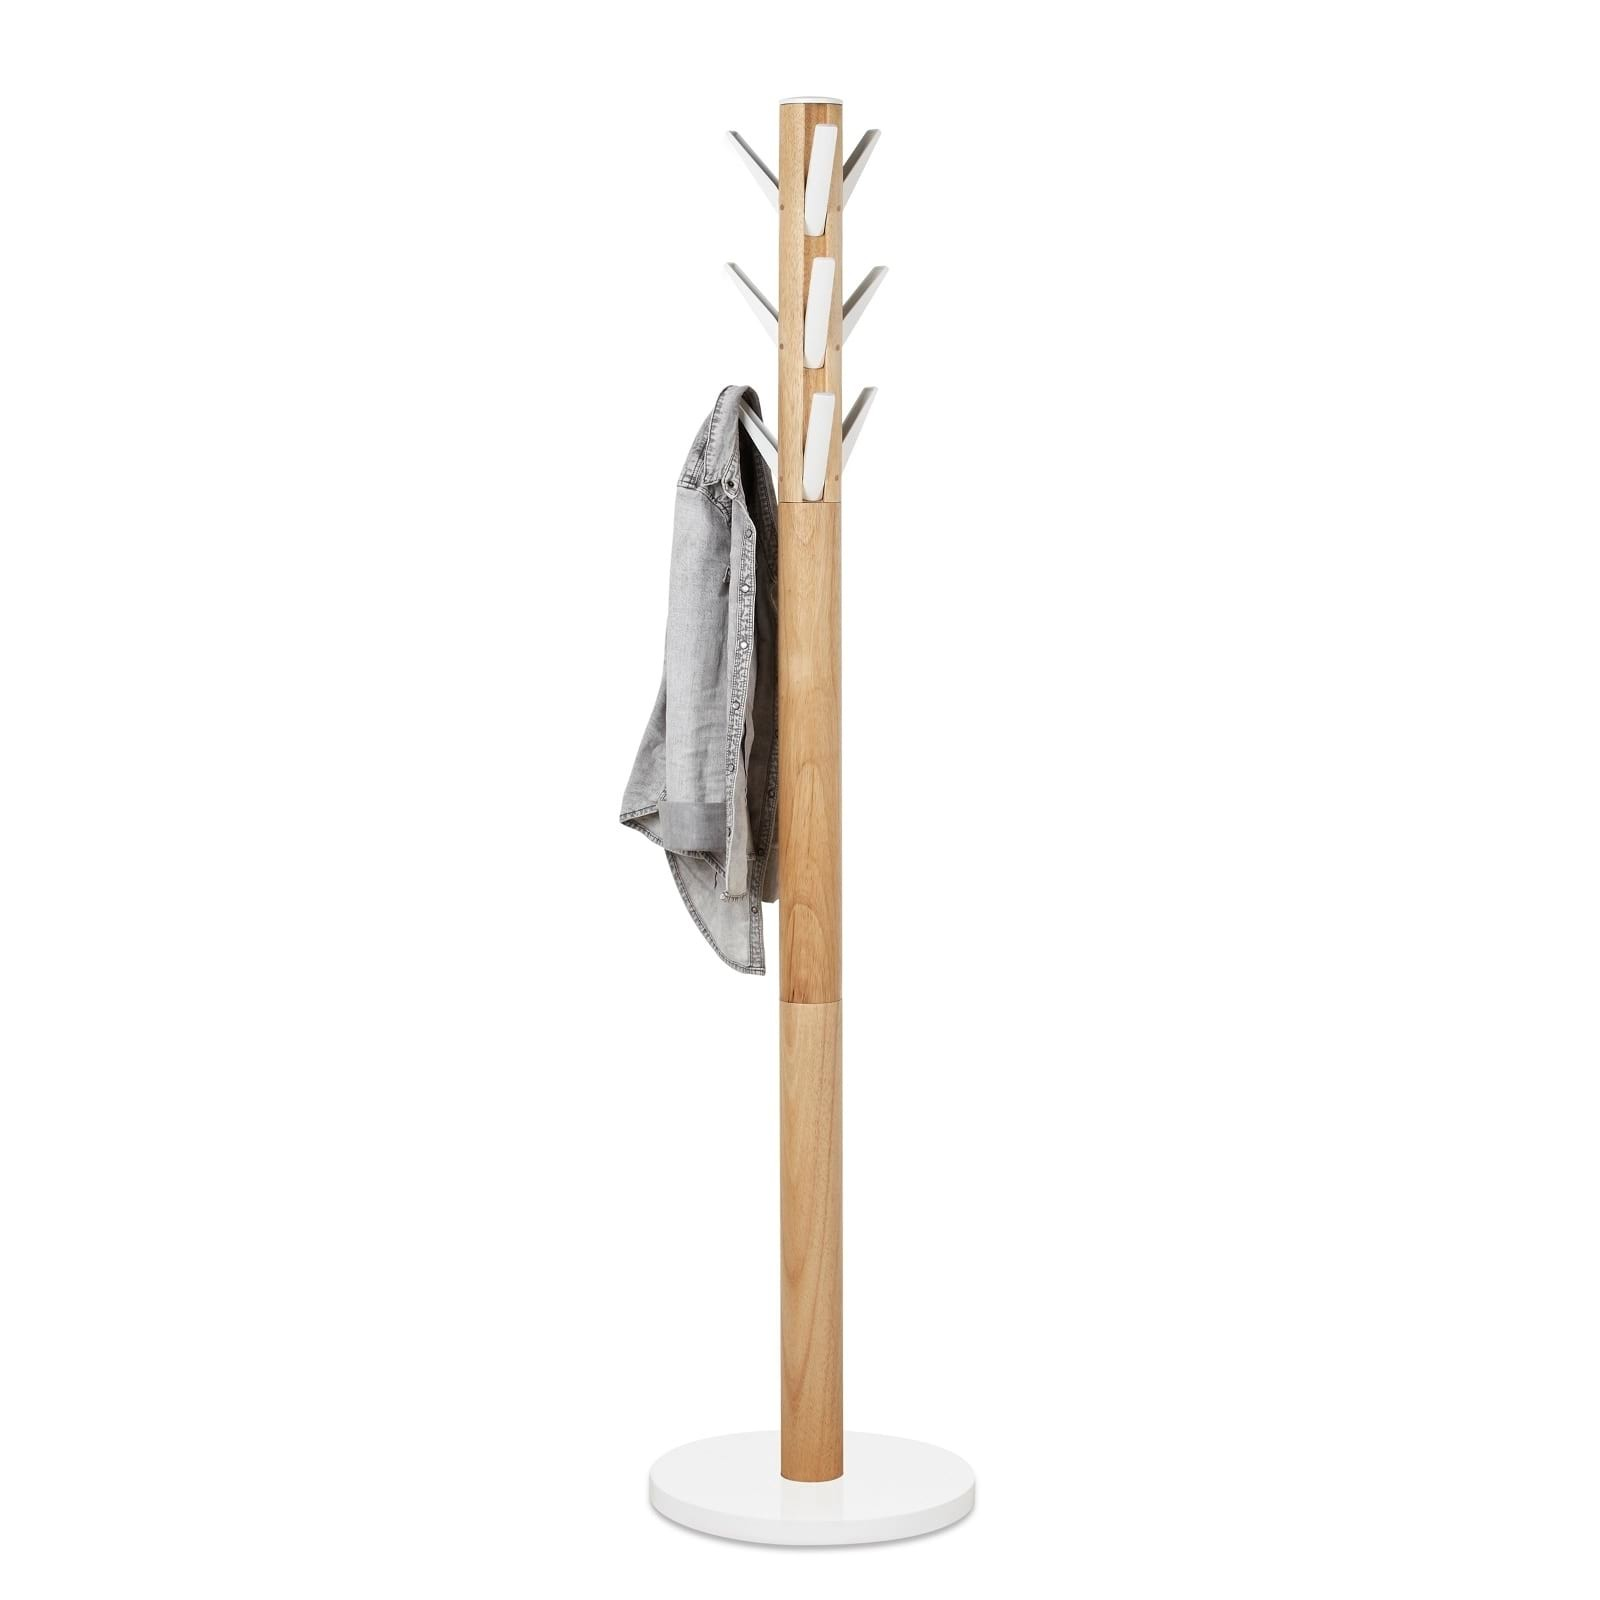 Flapper Coat Rack  (White / Natural) - Umbra